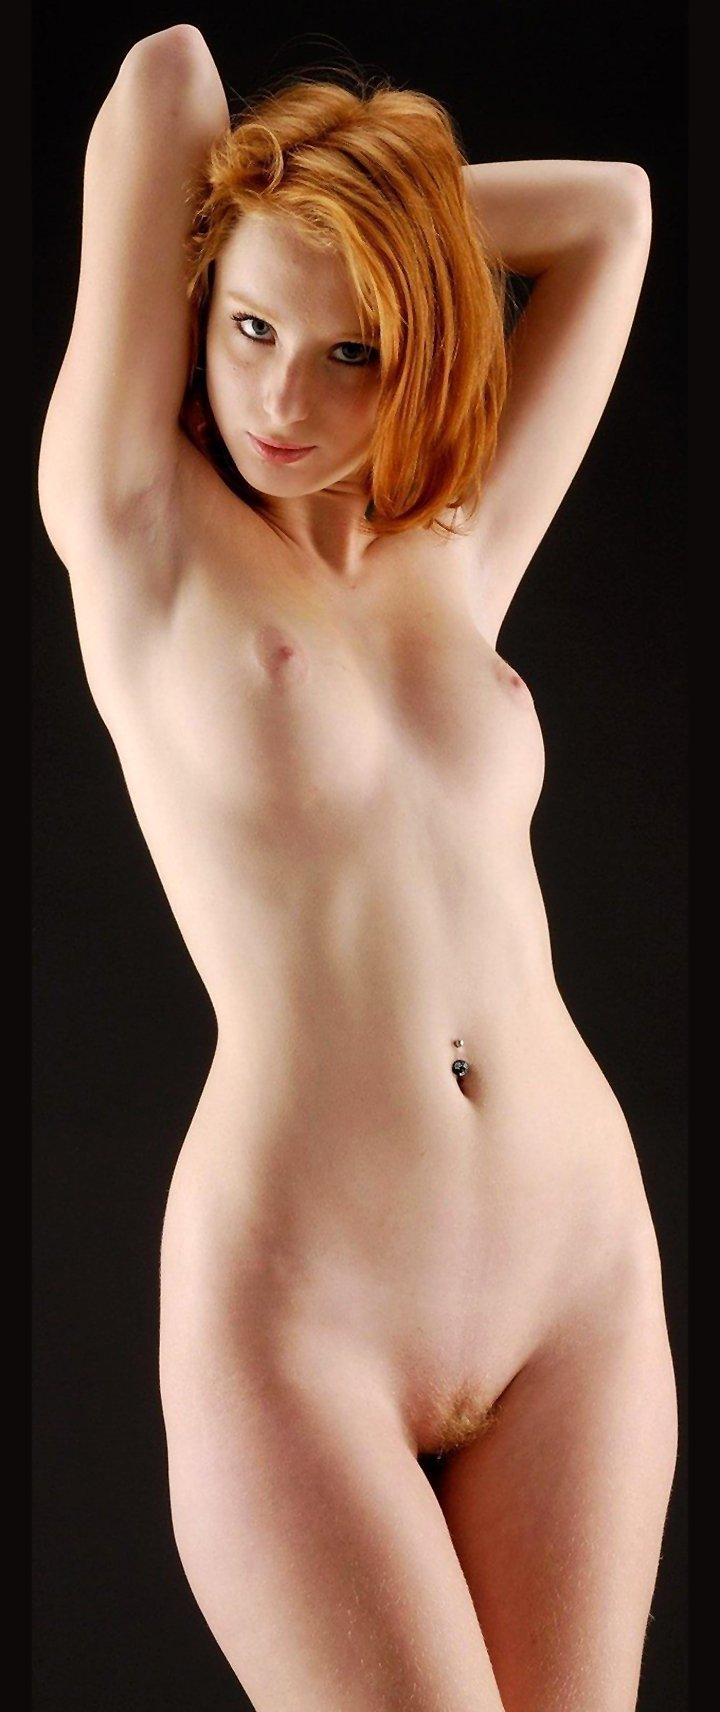 Beautiful redhead with amazing sexy body